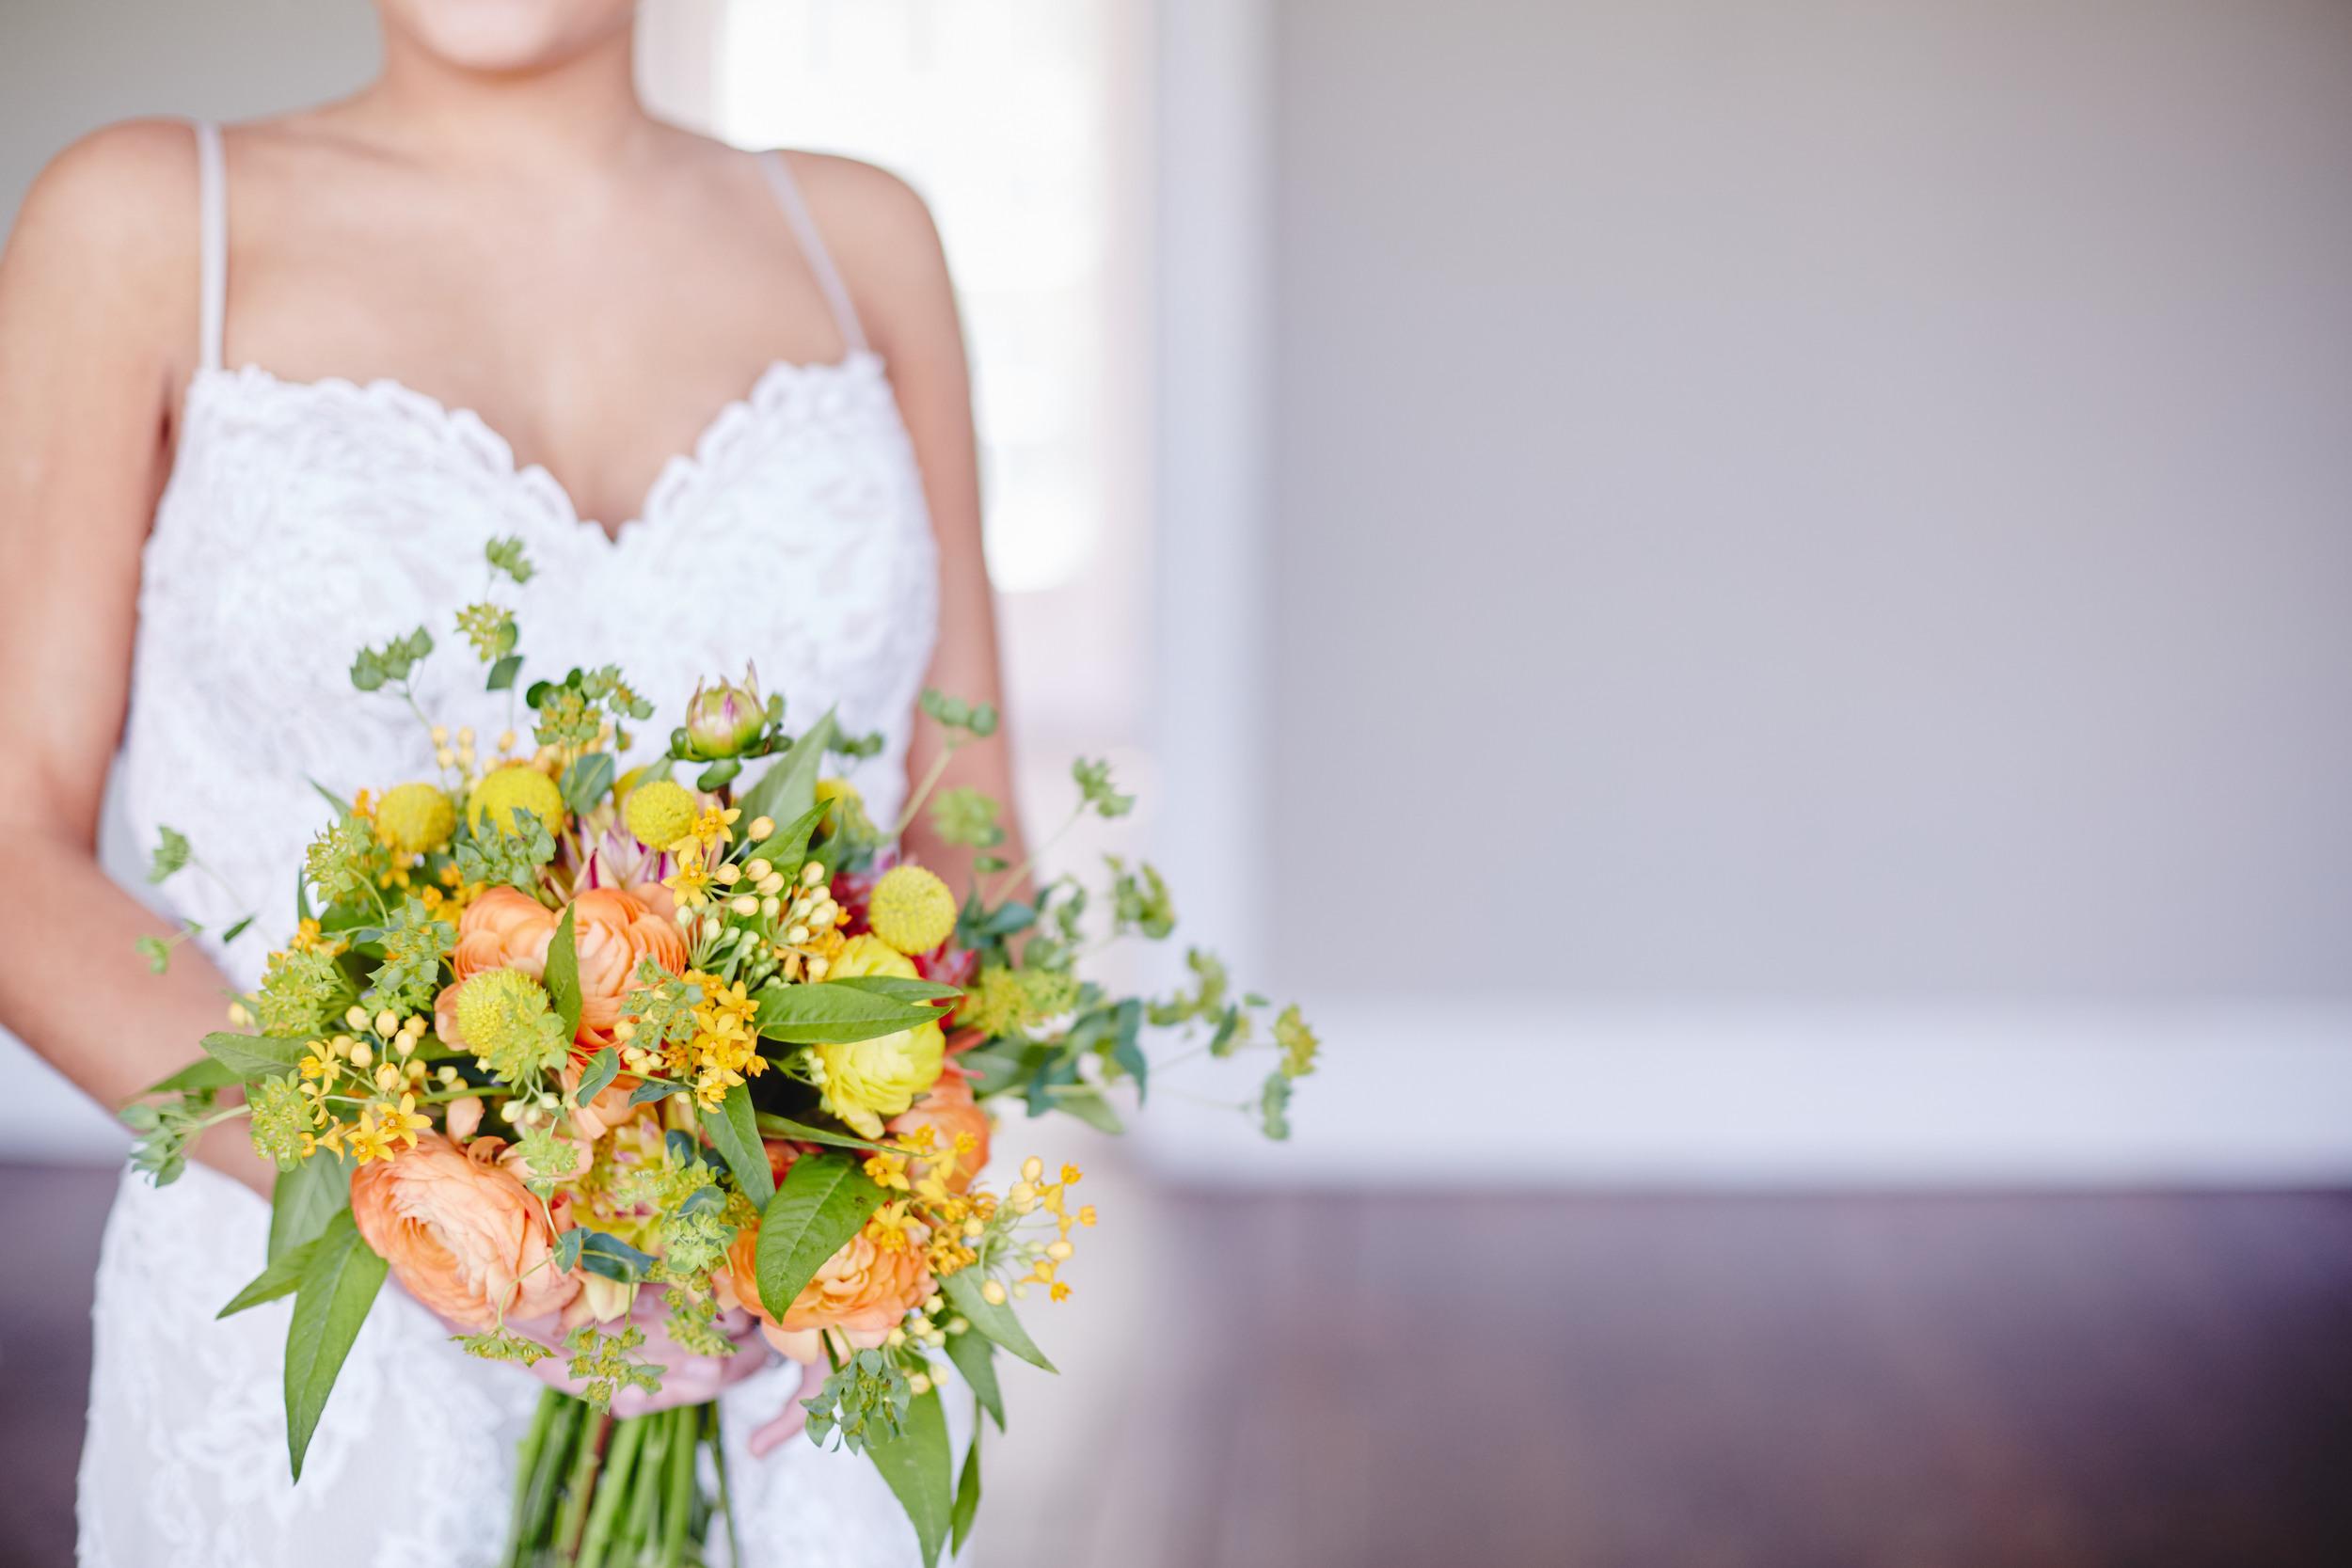 Styled_Session_Becca_Bridal_Portraits_Sarah_Tau_Photography_HOB_Studio_285 99.jpg